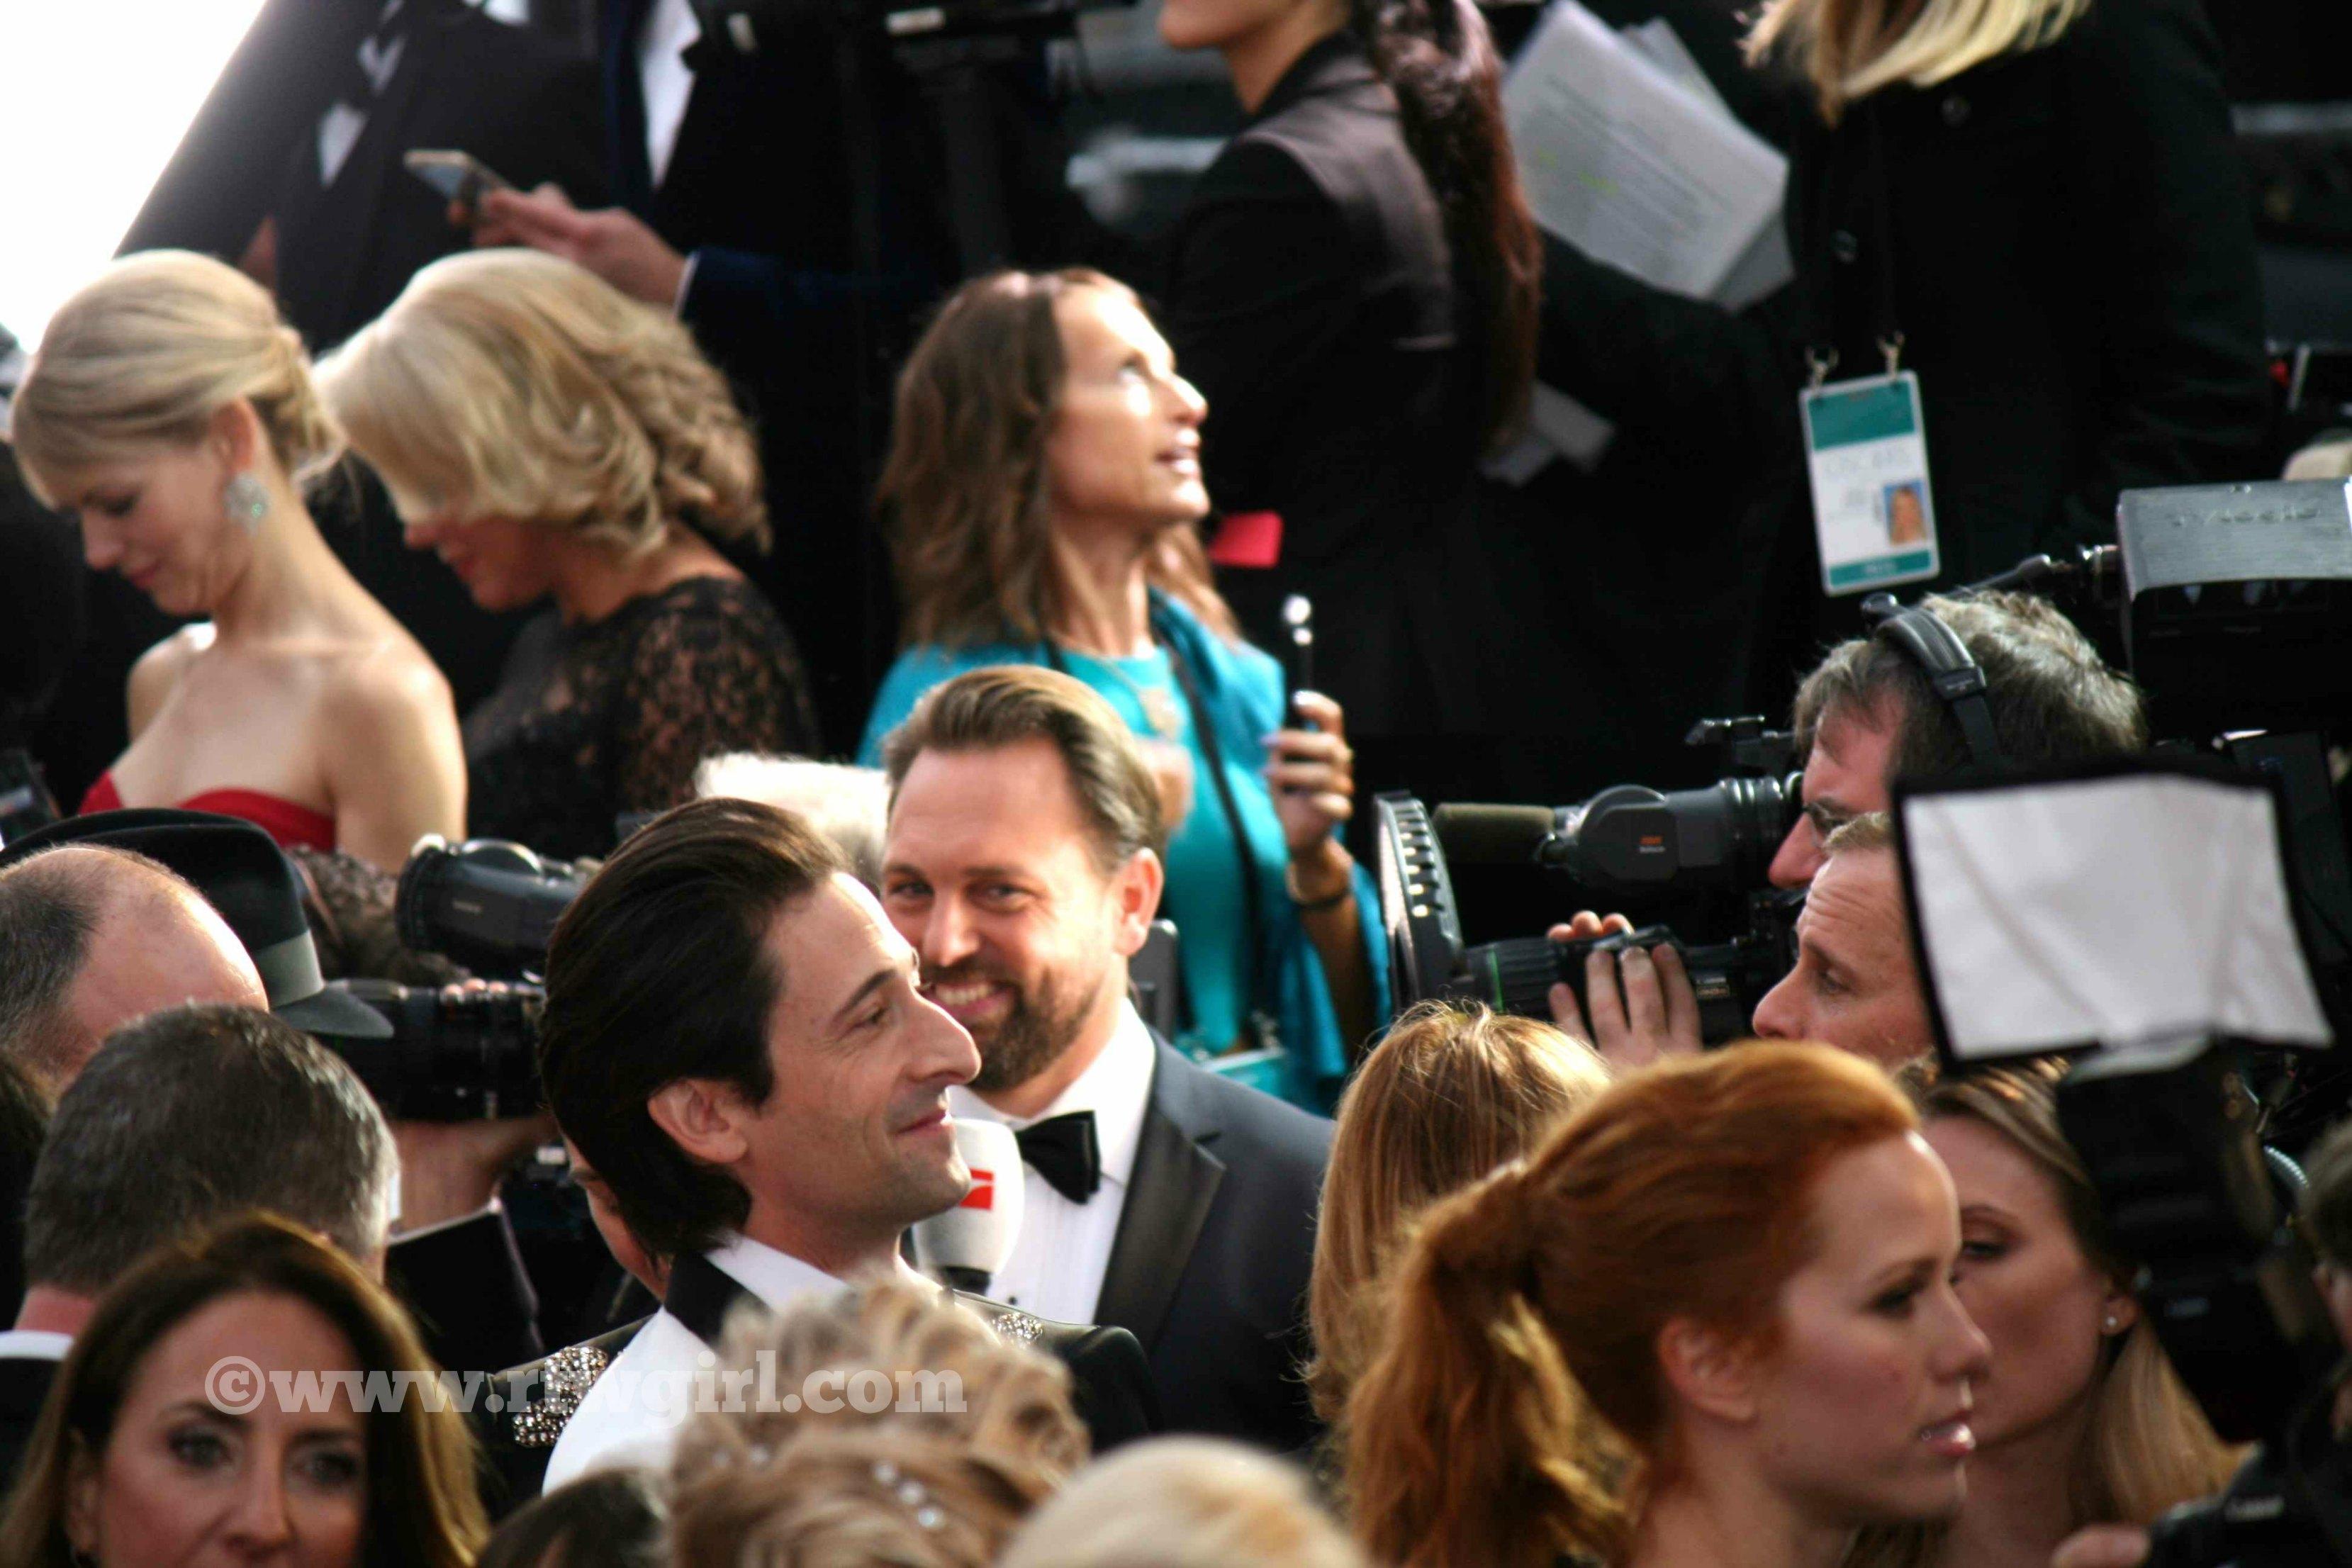 Adrian Brody Red Carpet 2015